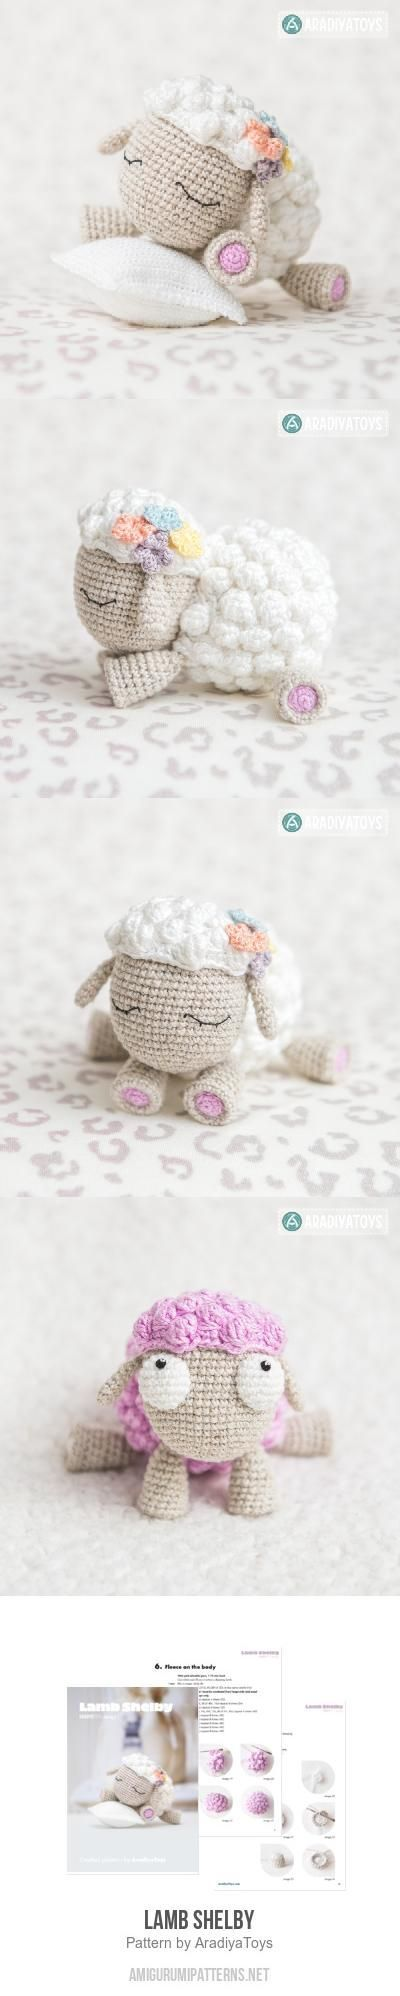 102 best Dishcloth images on Pinterest | Garter stitch, Knit ...